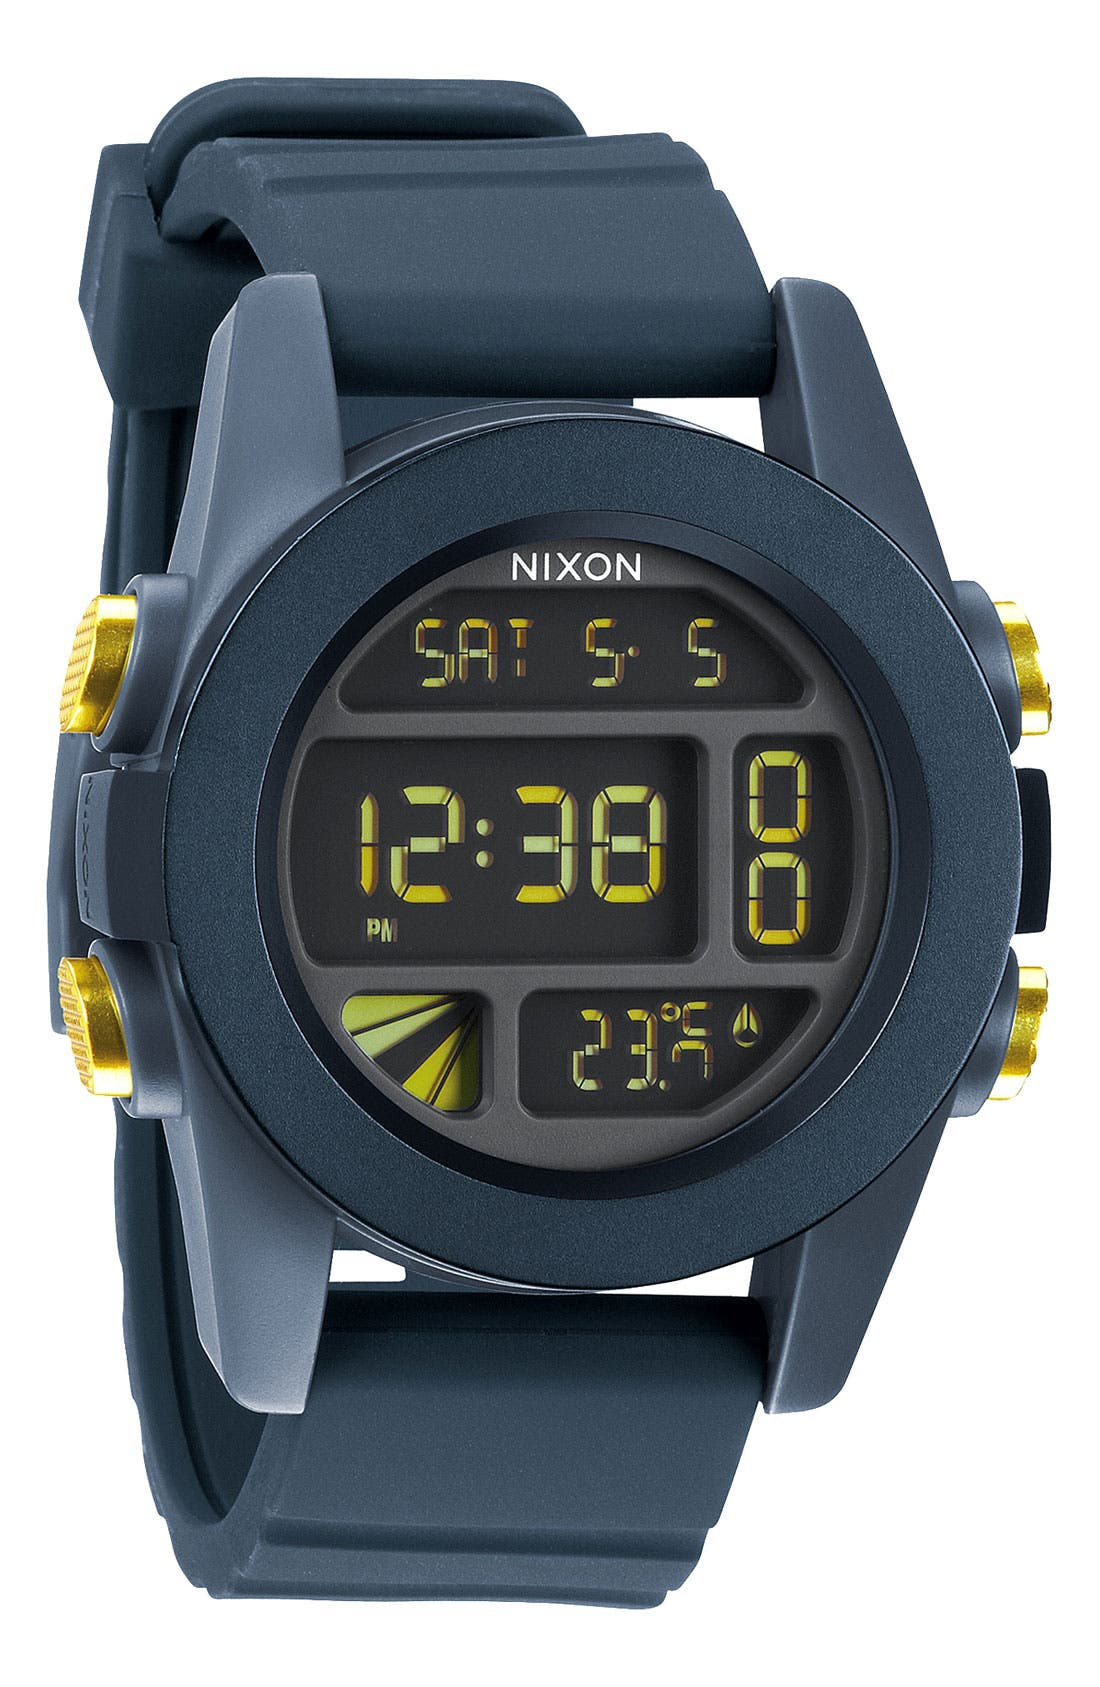 Main Image - Nixon 'The Anodaze Unit' Digital Watch, 49mm